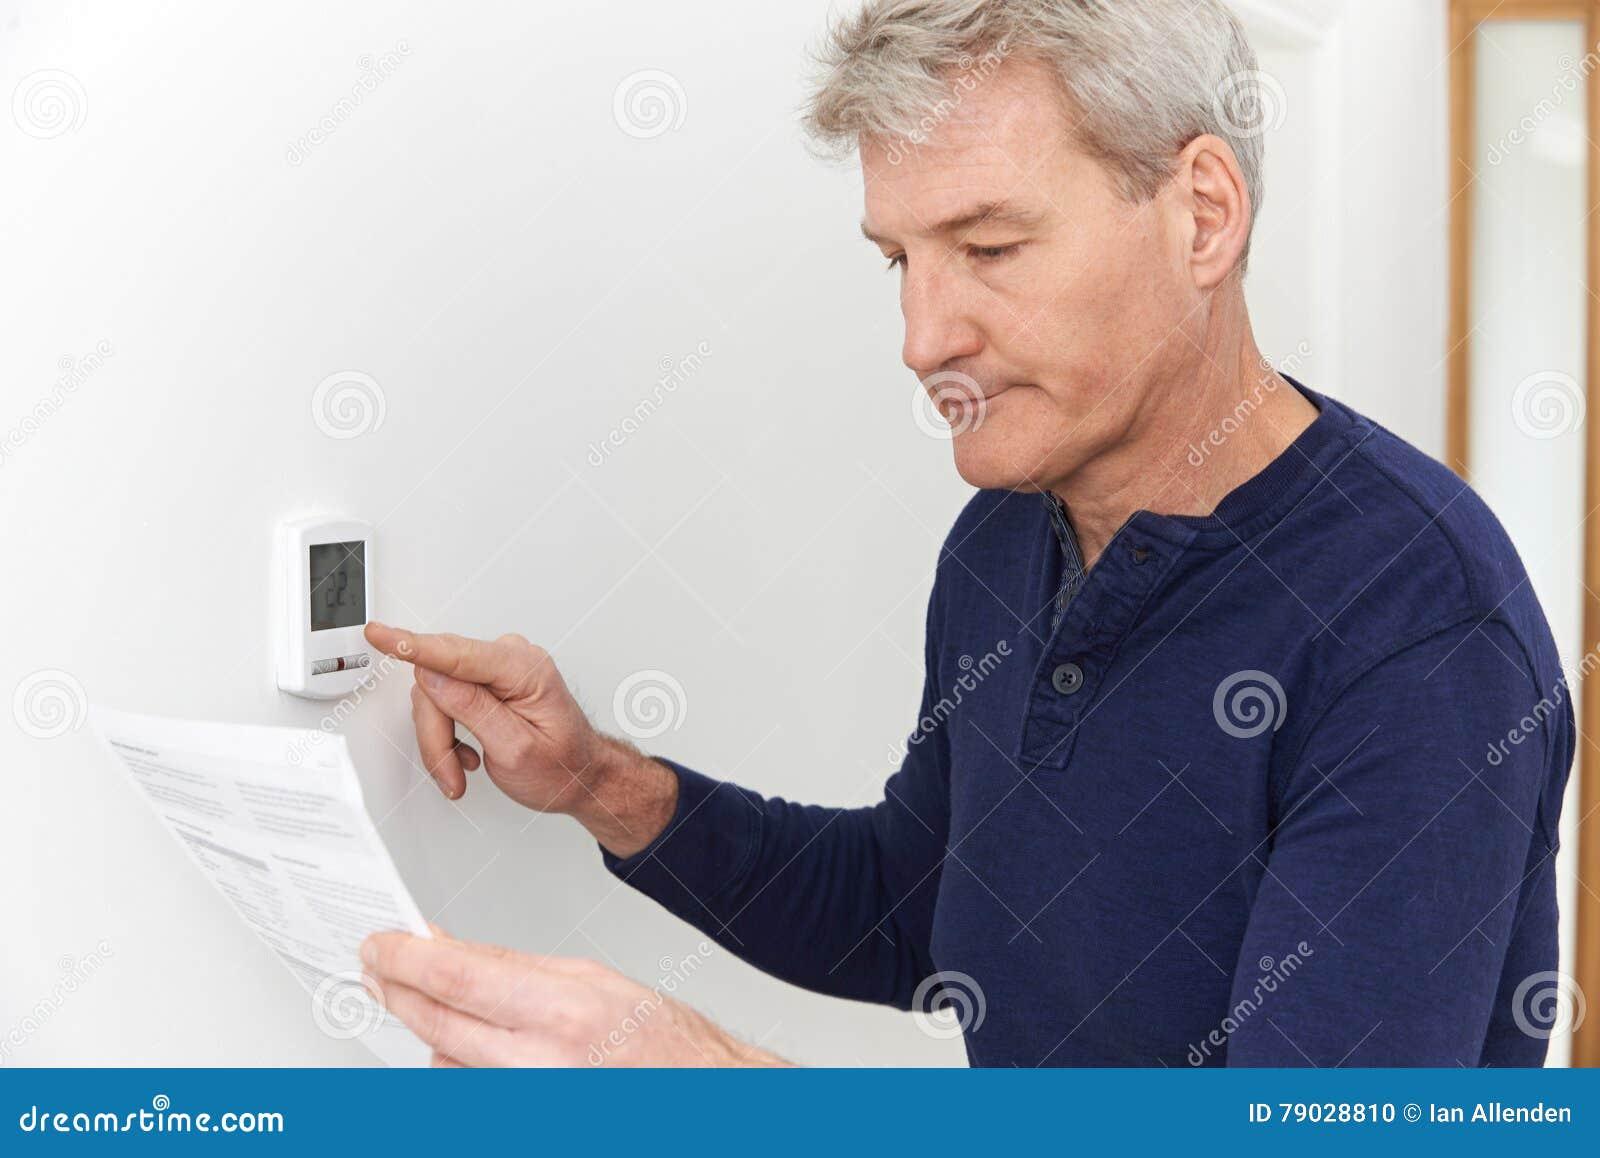 Ongerust gemaakte Rijpe Mens met Bill Turning Down Heating Thermostat